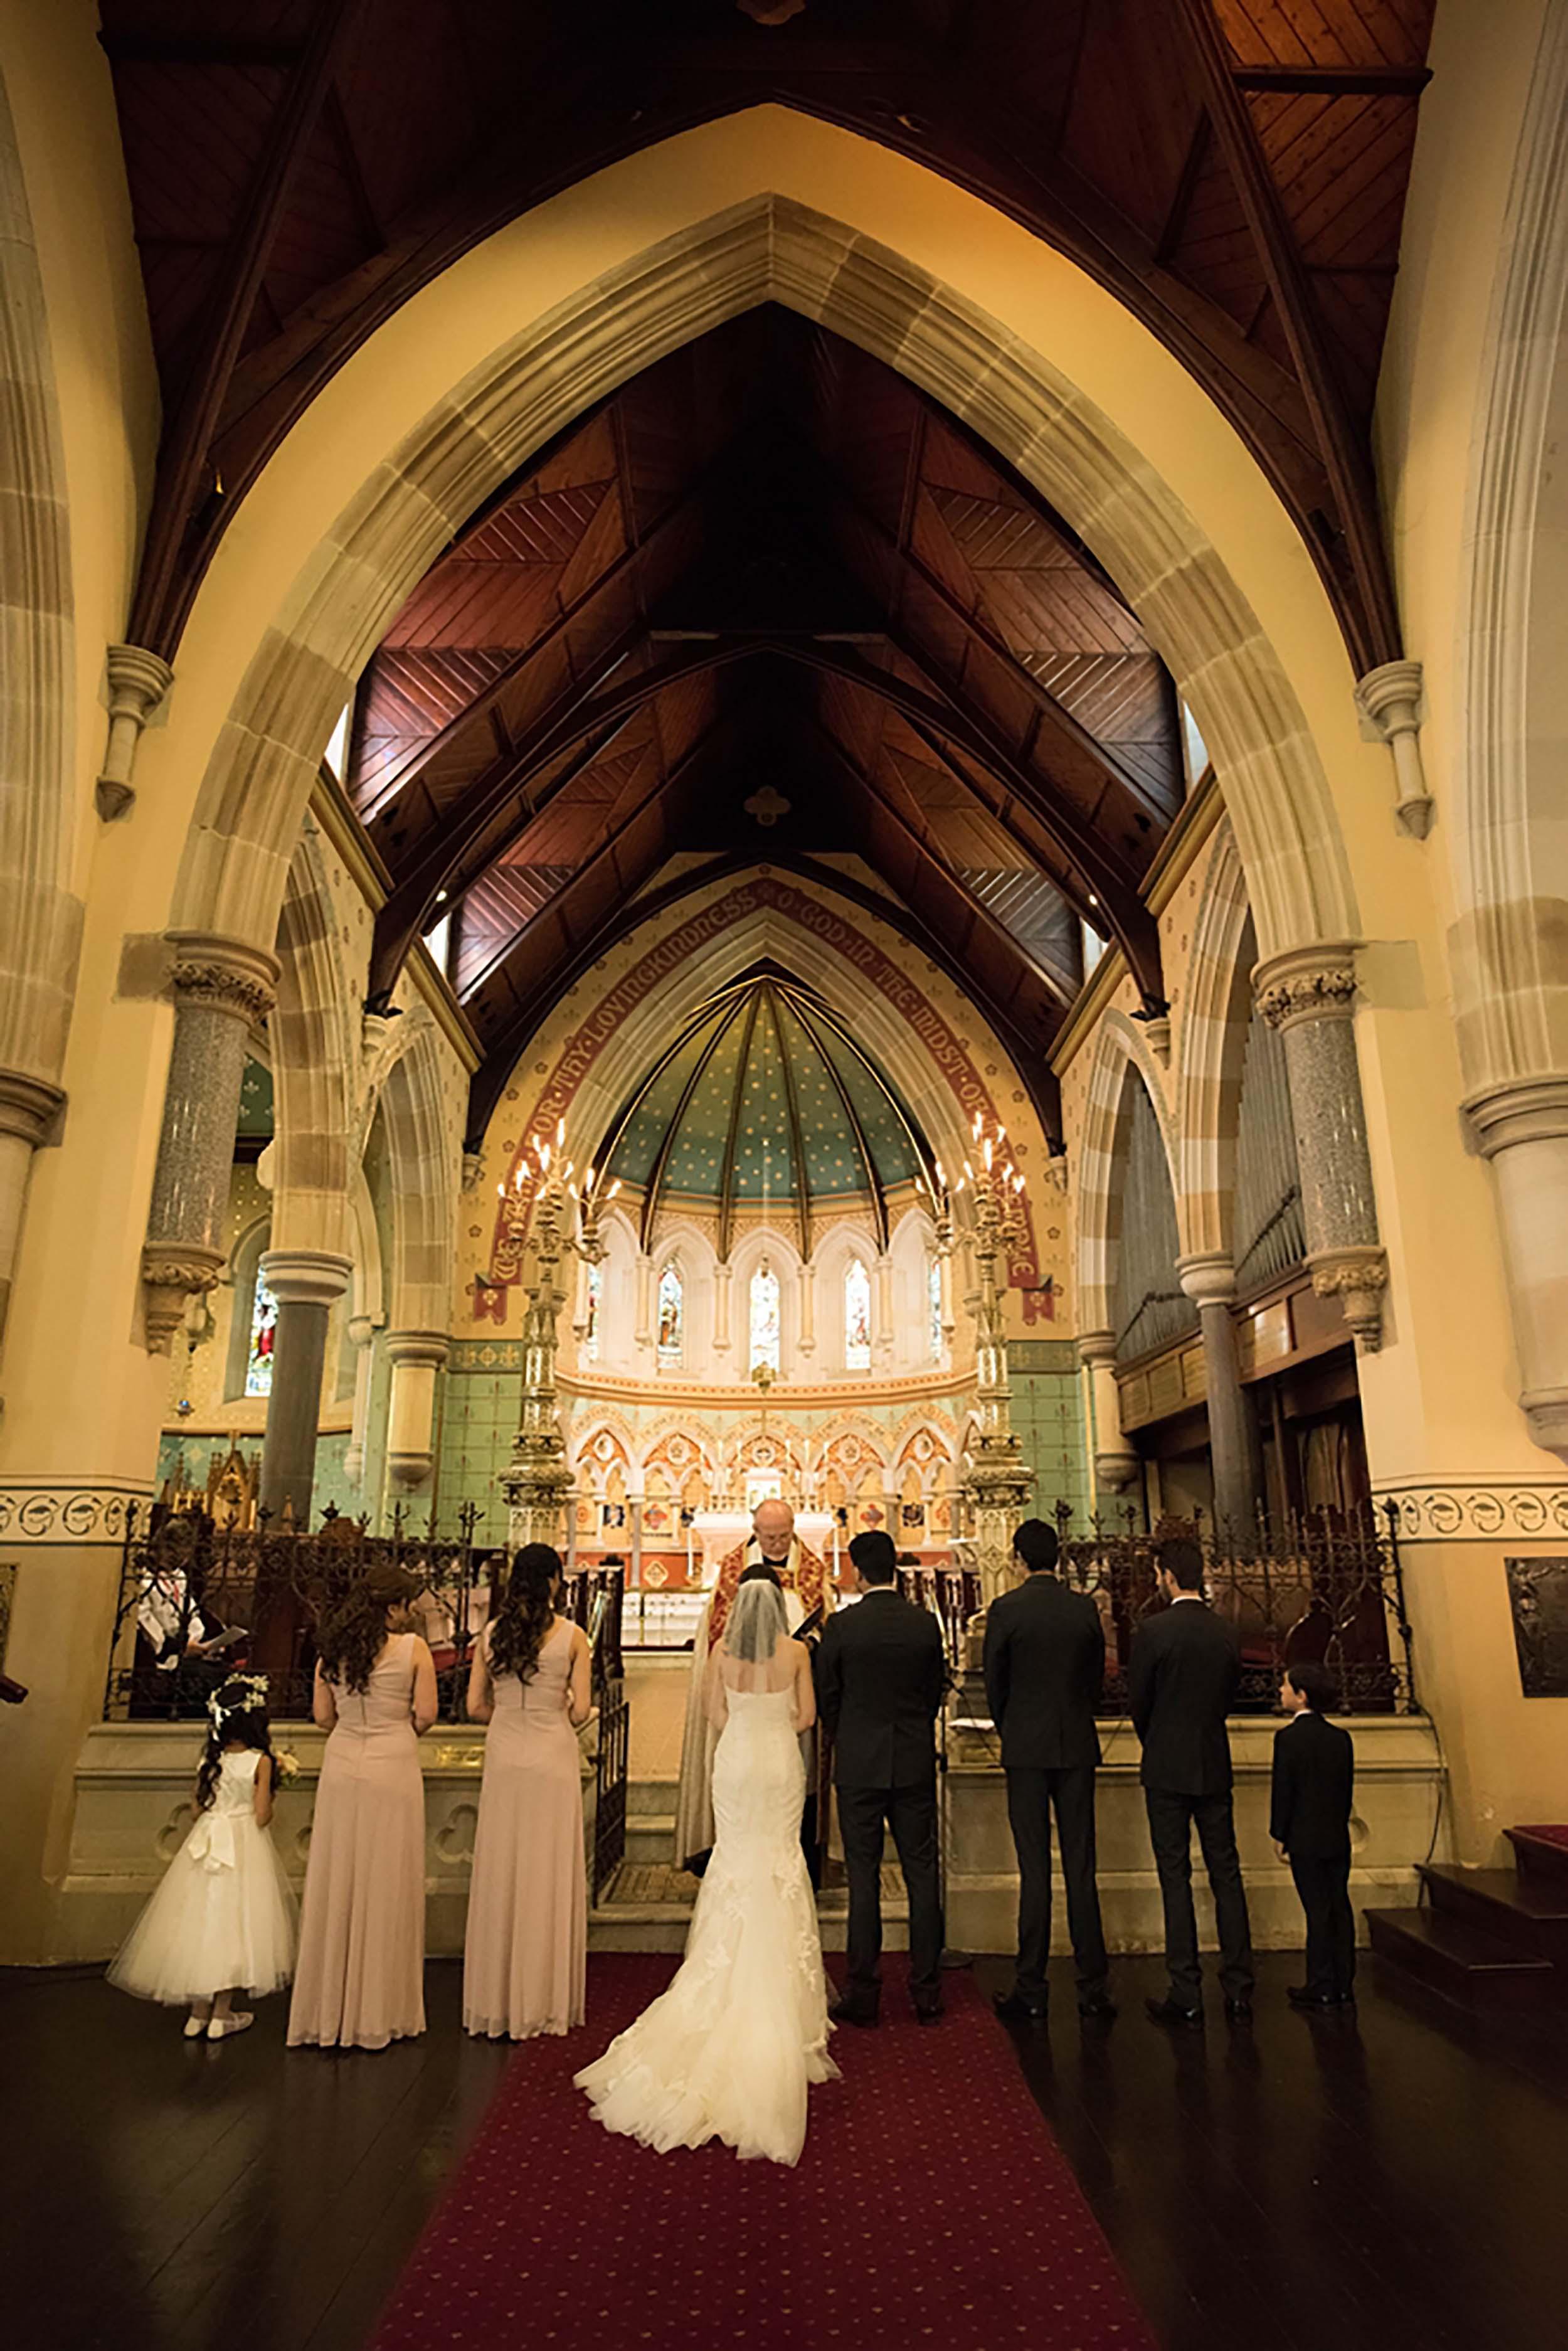 All Saints Anglican Church in Australia